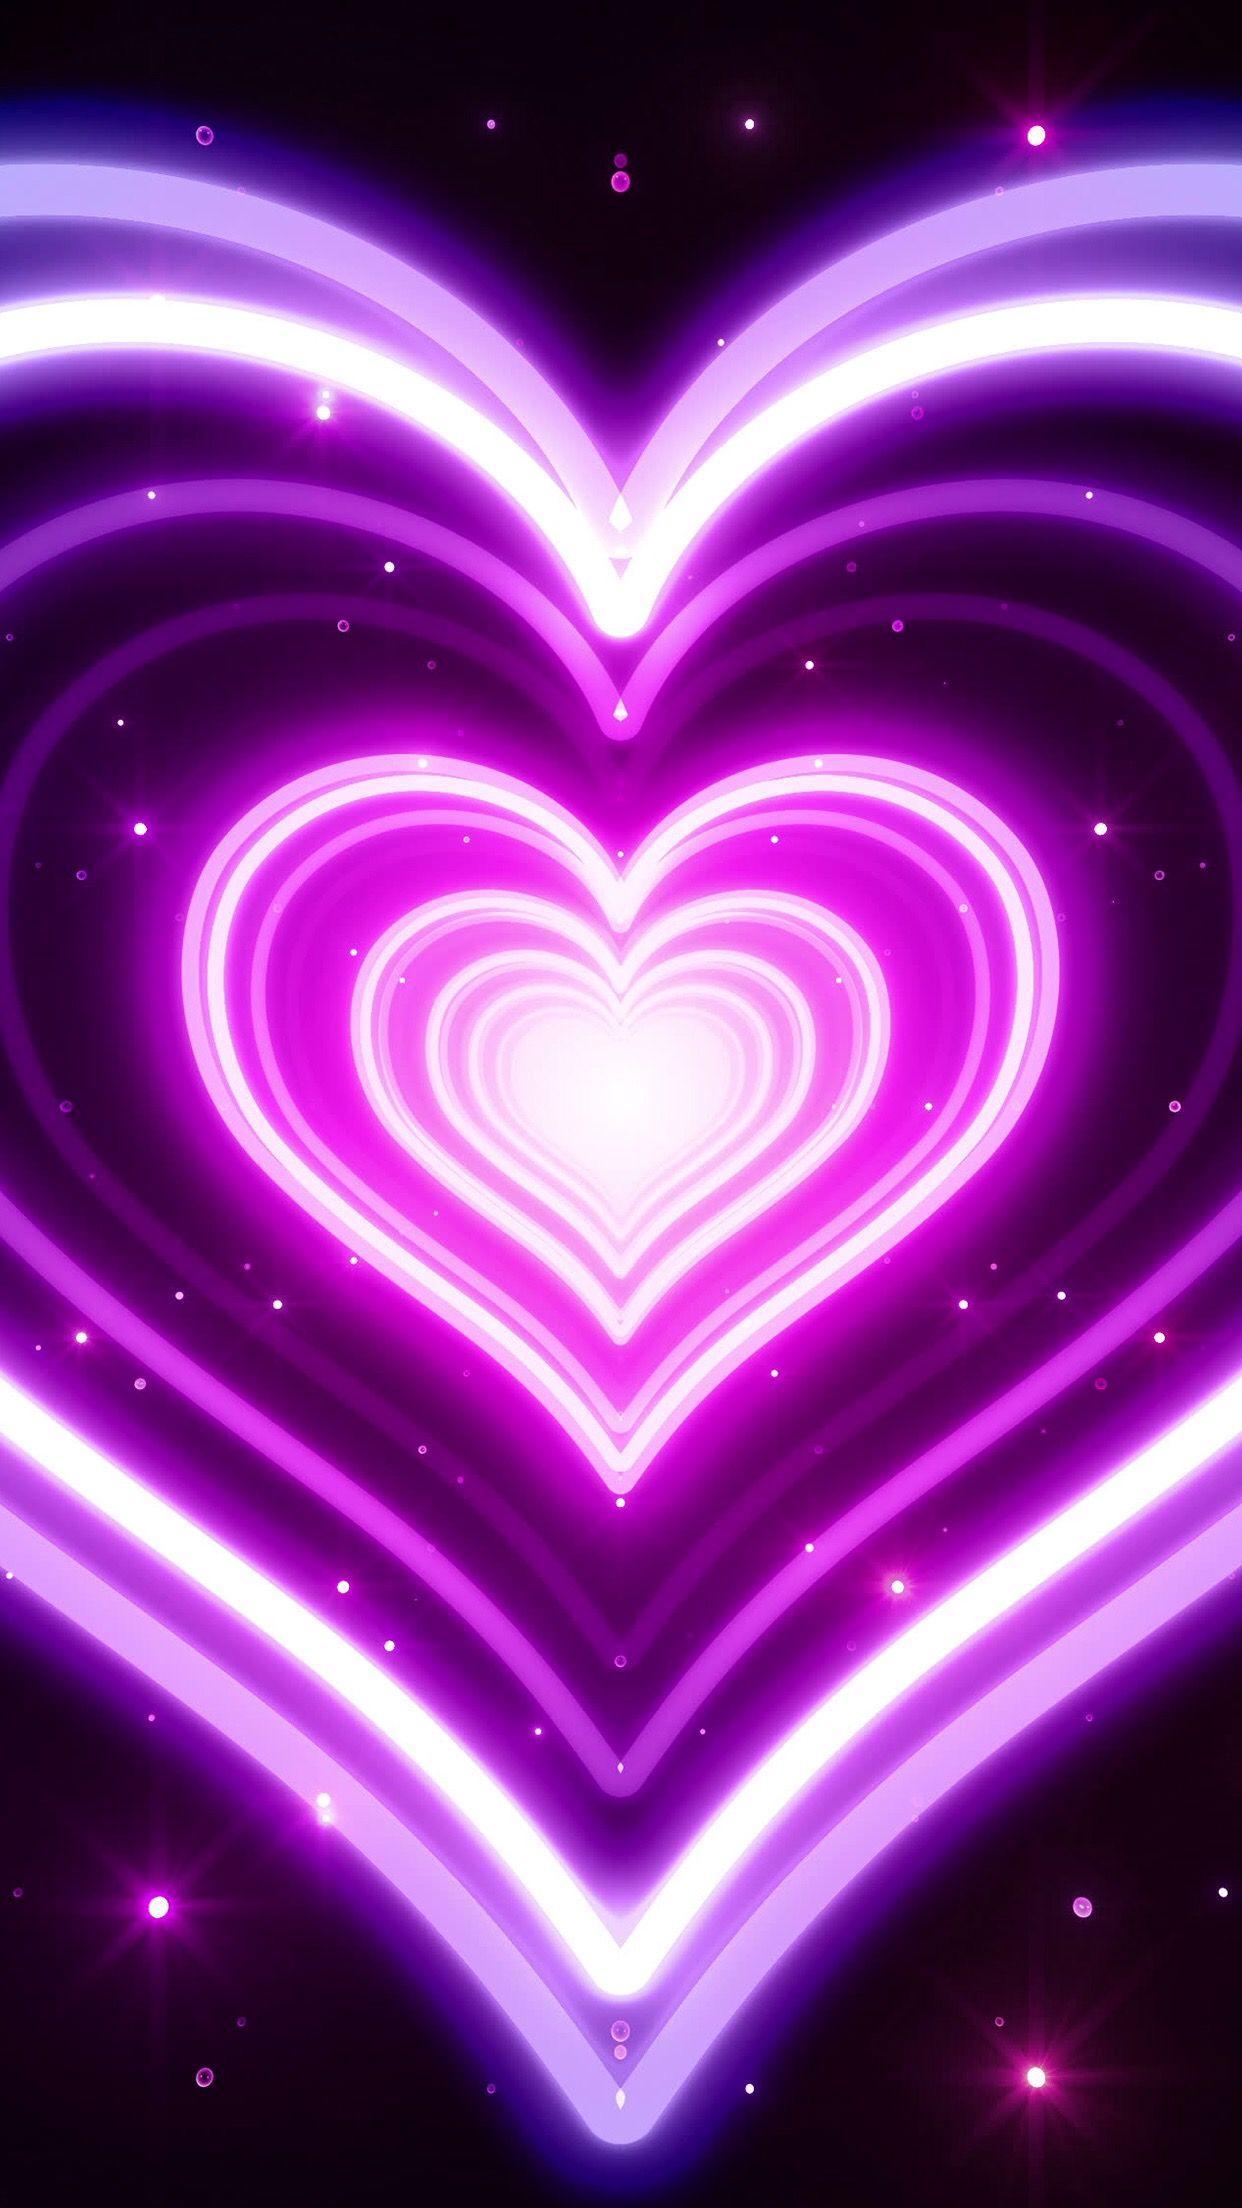 Neon Hearts Wallpapers - Wallpaper Cave